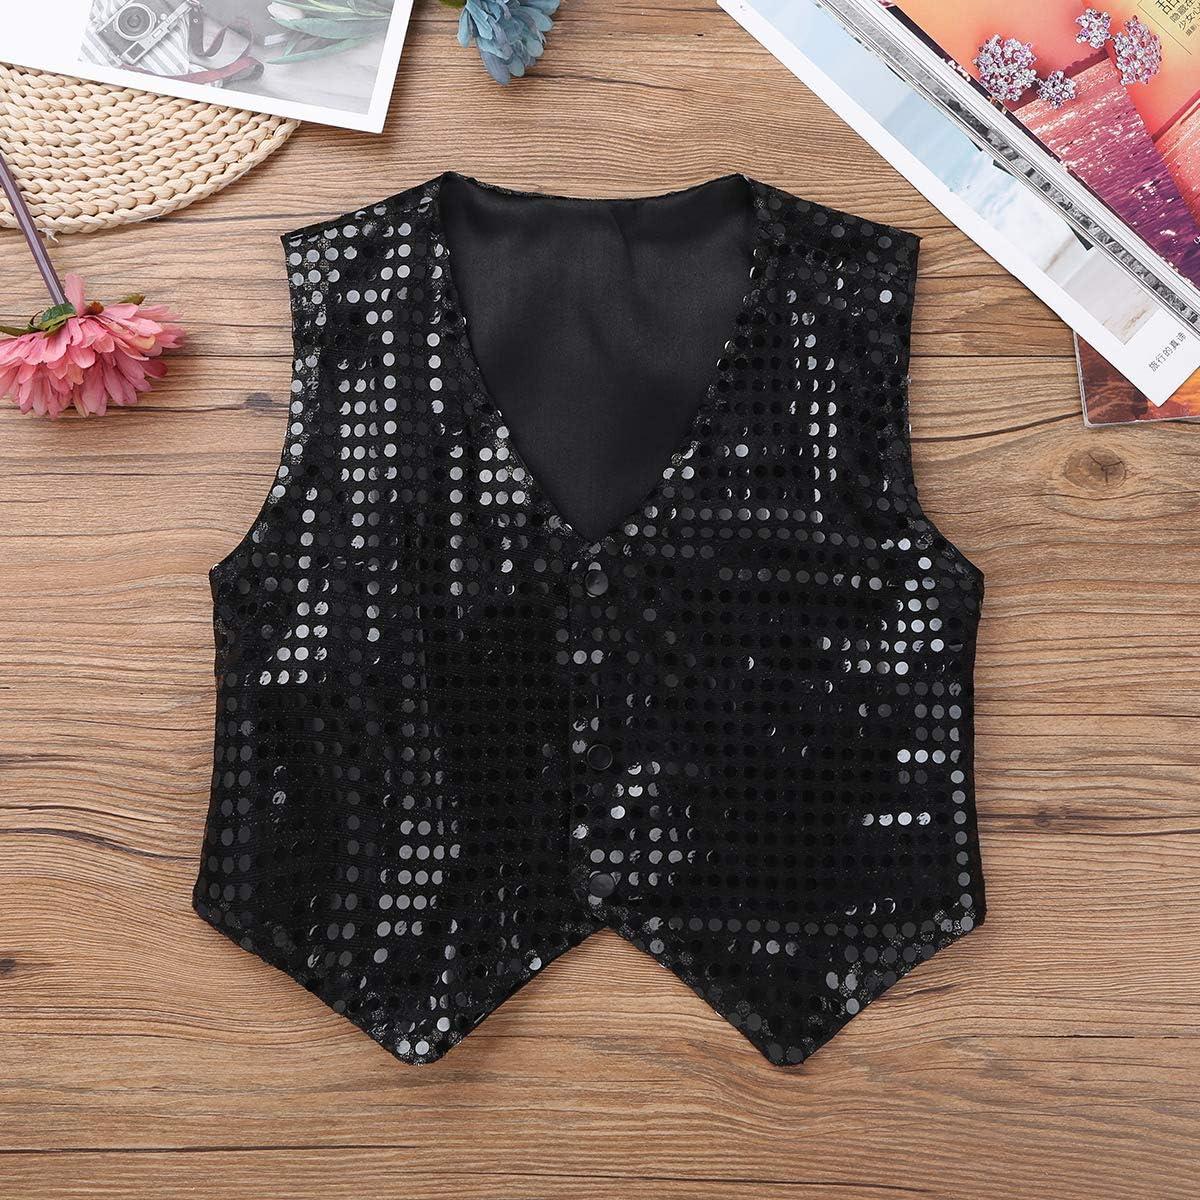 CHICTRY Kids Boys Sparkly Sequins Vest Pre-Tied Bowtie Waistcoat Set